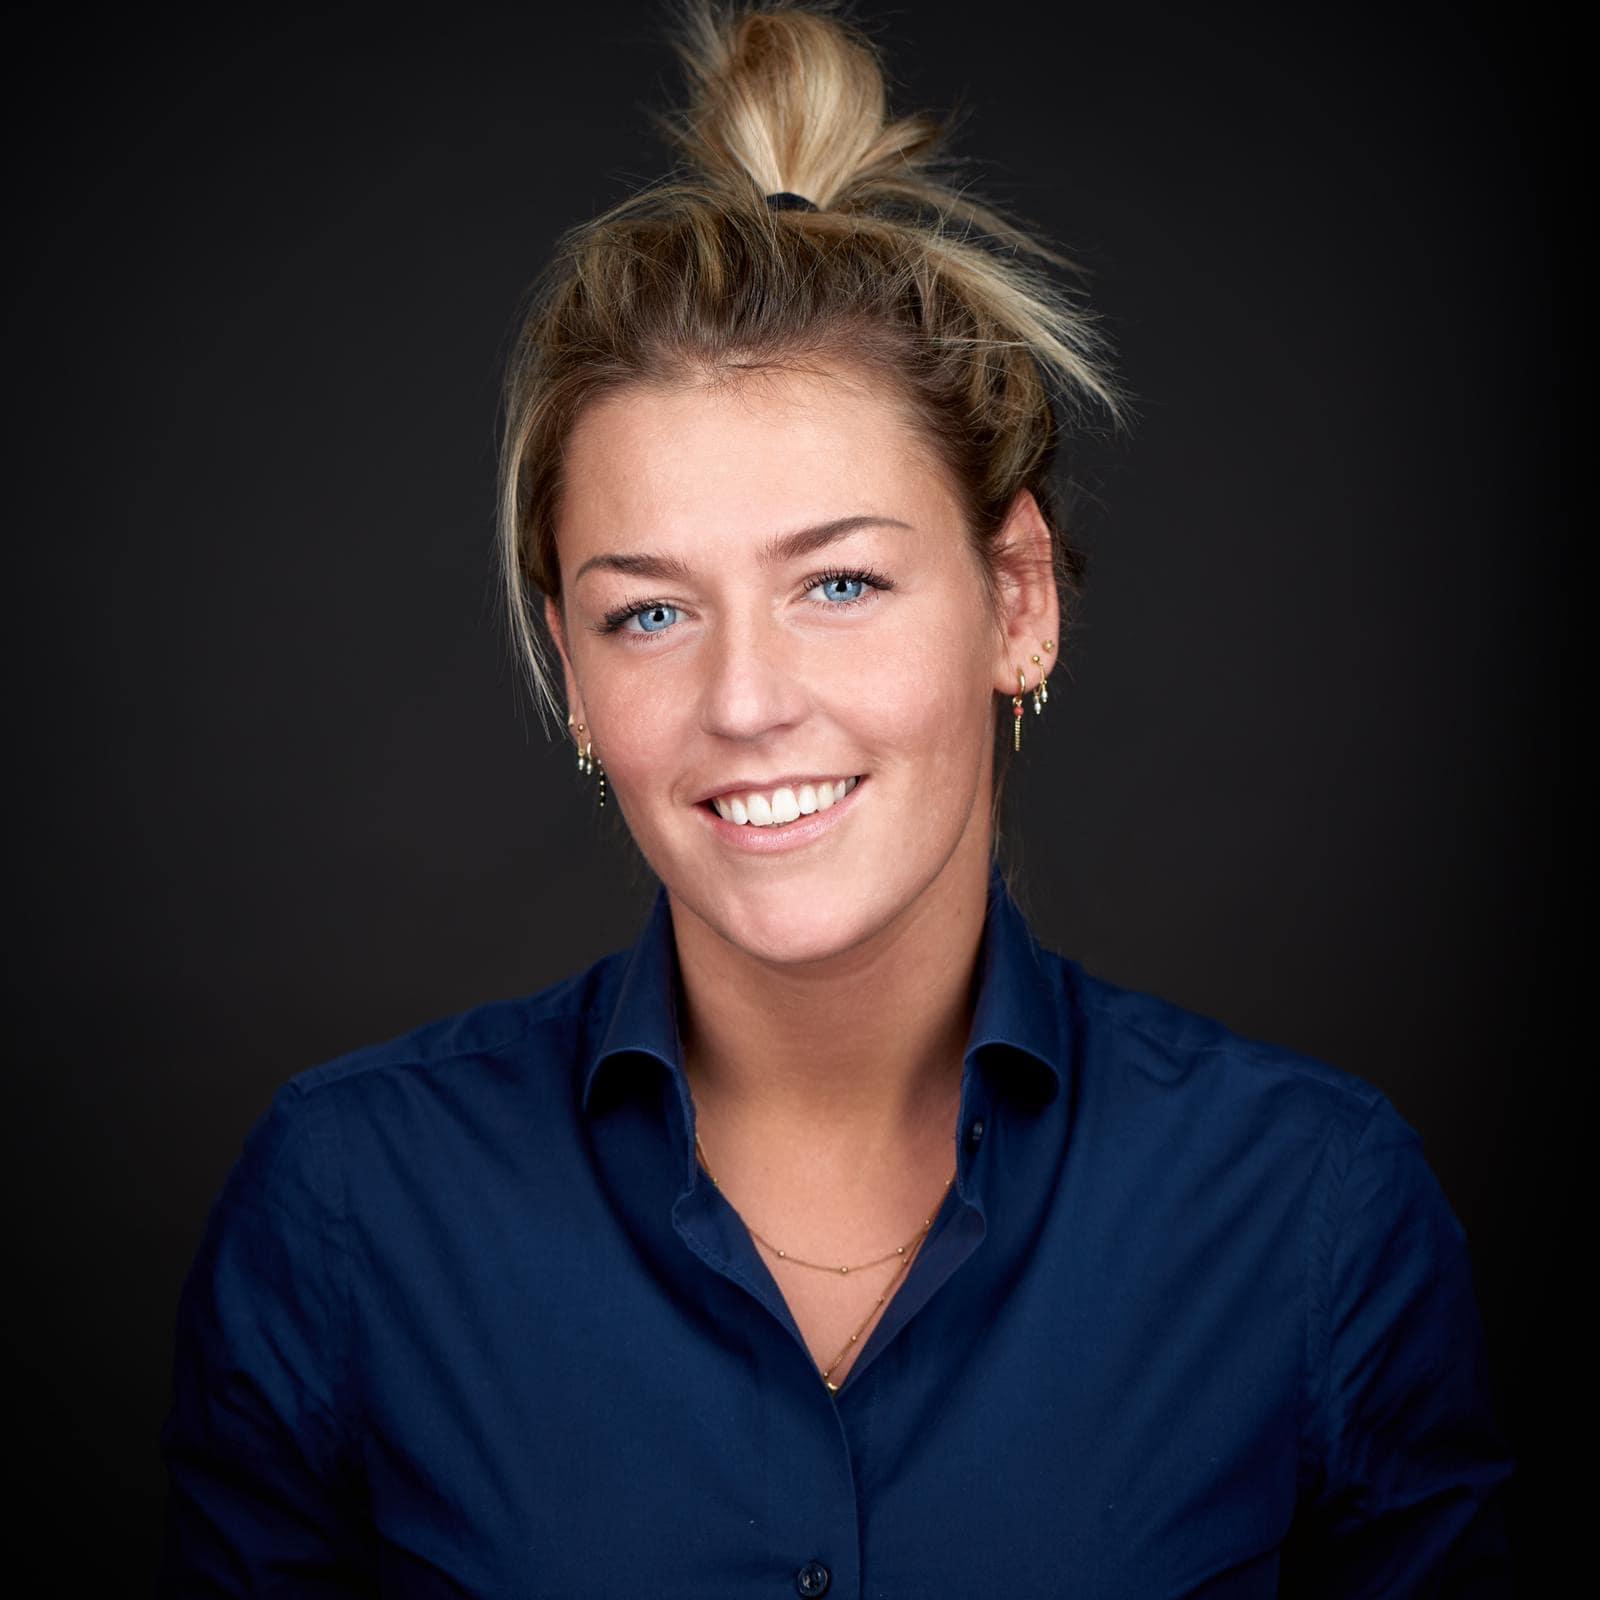 Personal trainer Joraline Krachtwereld.nl